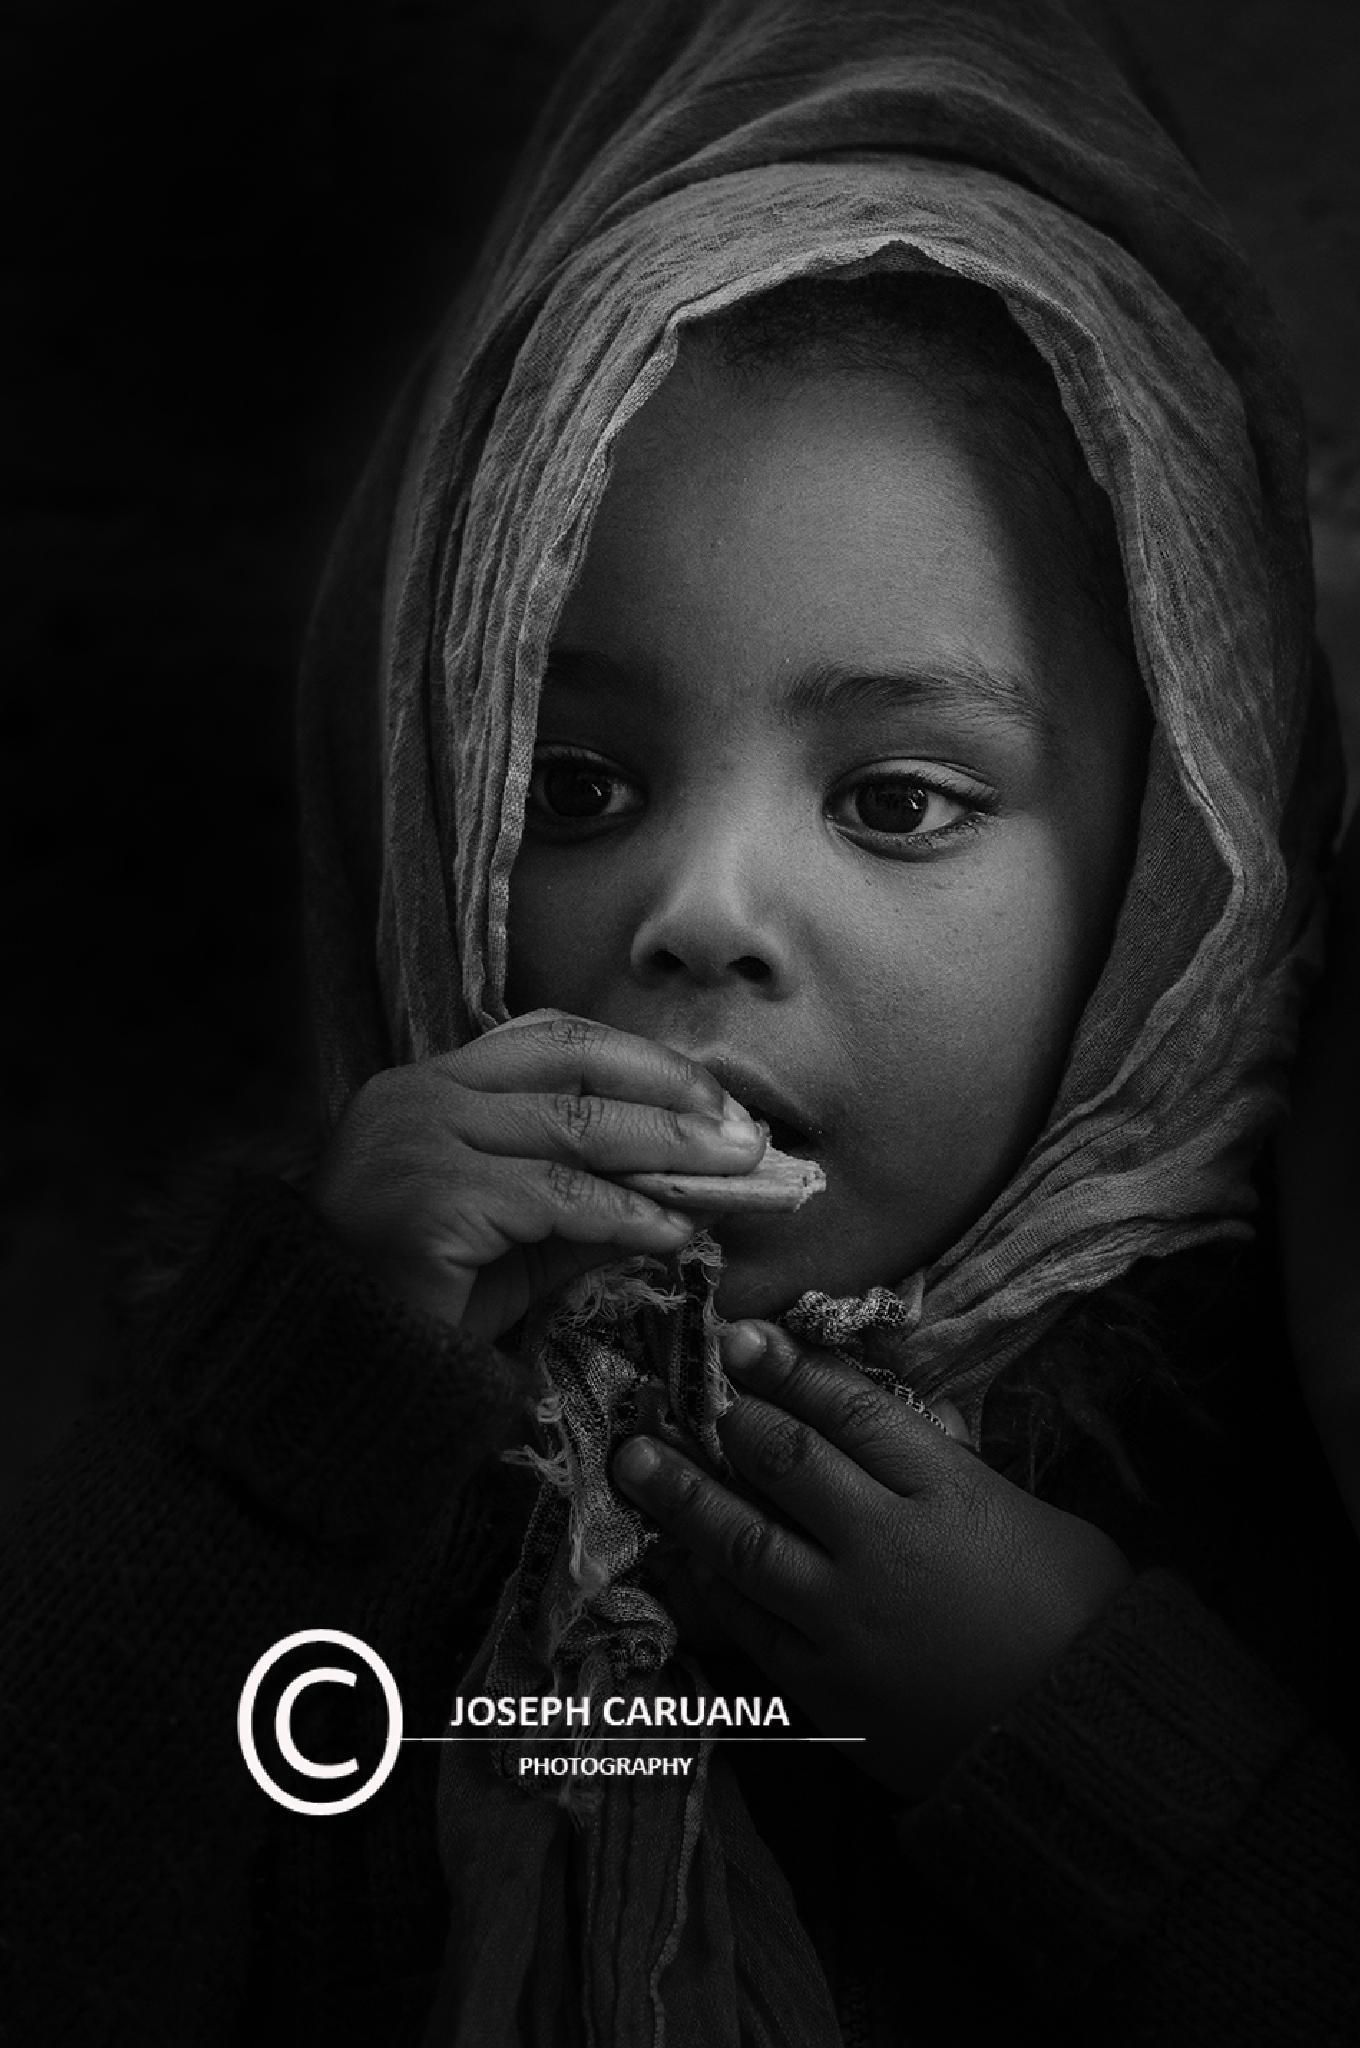 Eritrean girl by Joe Caruana